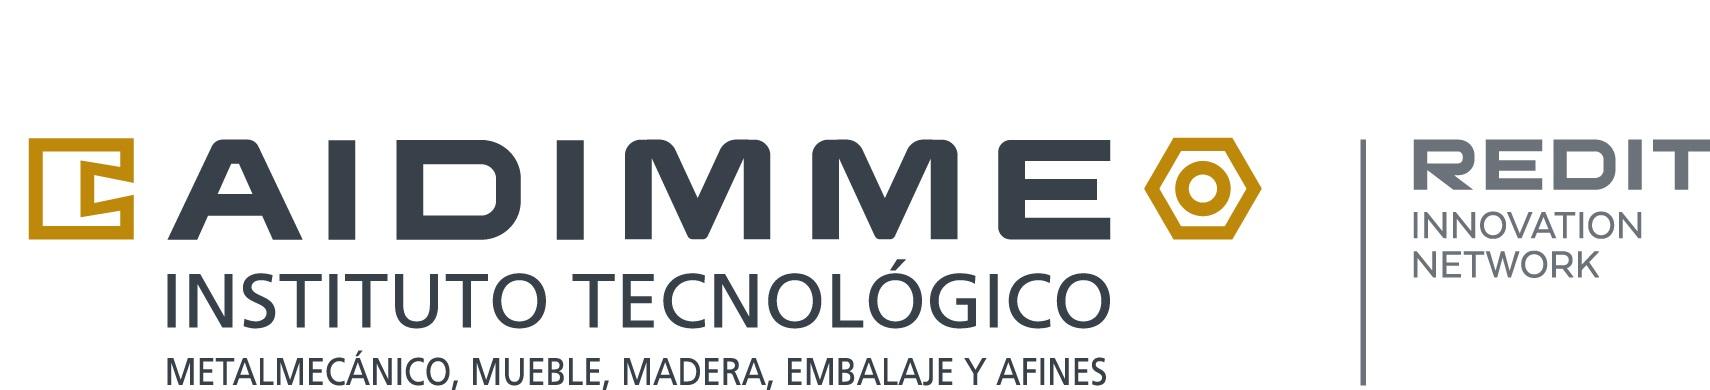 Instituto Tecnológico Metalmecánico, Mueble, Madera, Embalaje y Afines (AIDIMME)